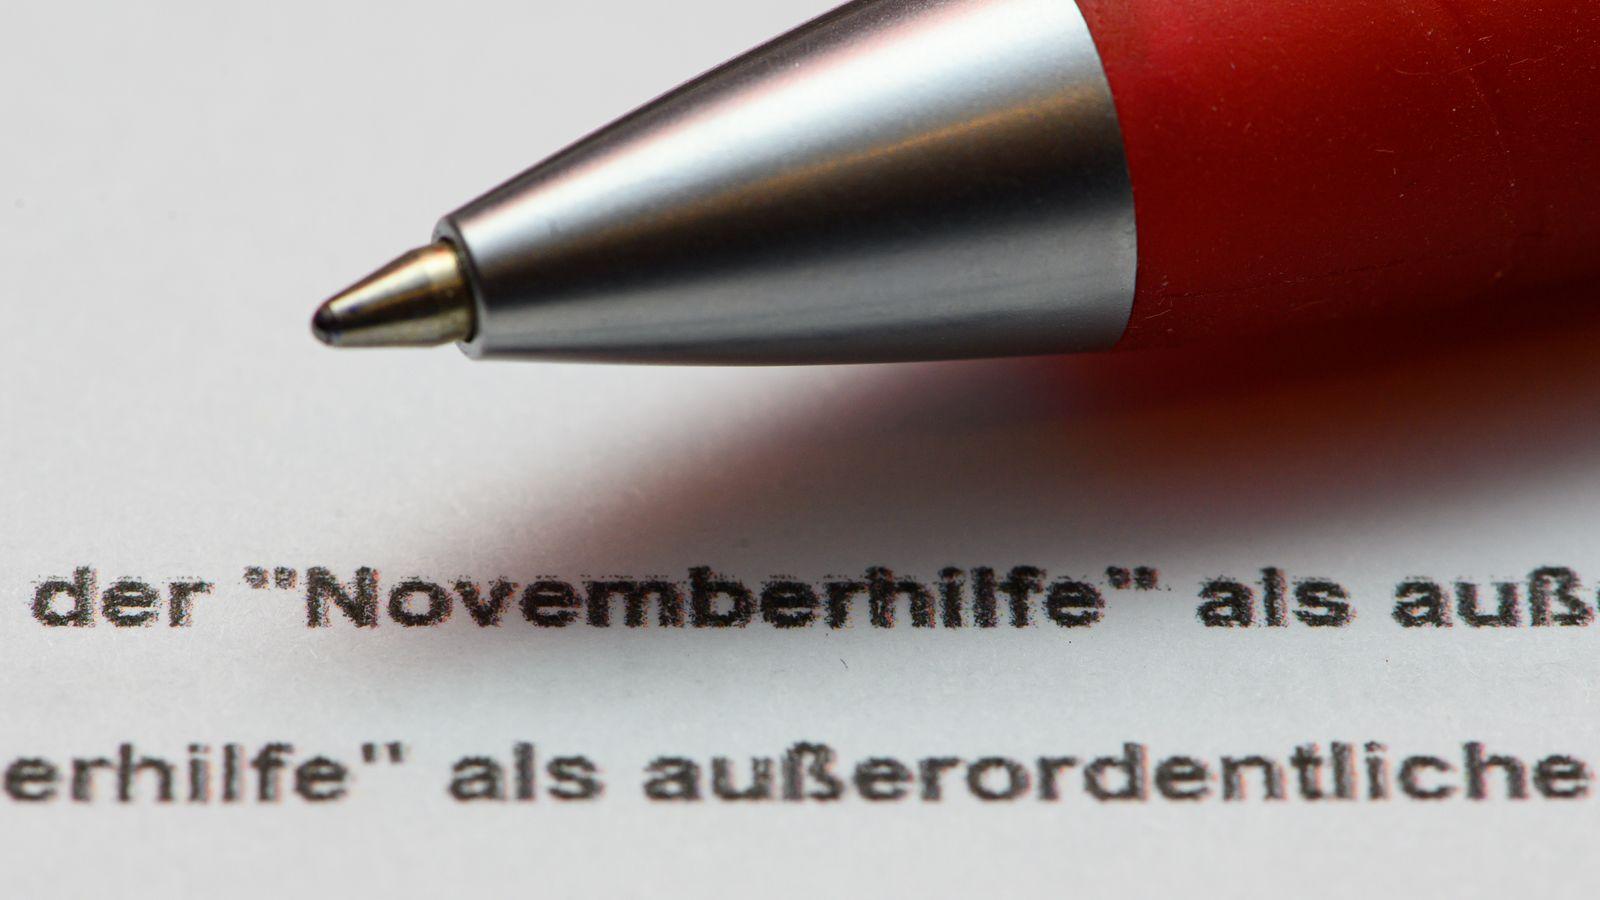 Wegen Softwareproblemen: Novemberhilfen erst im Januar?